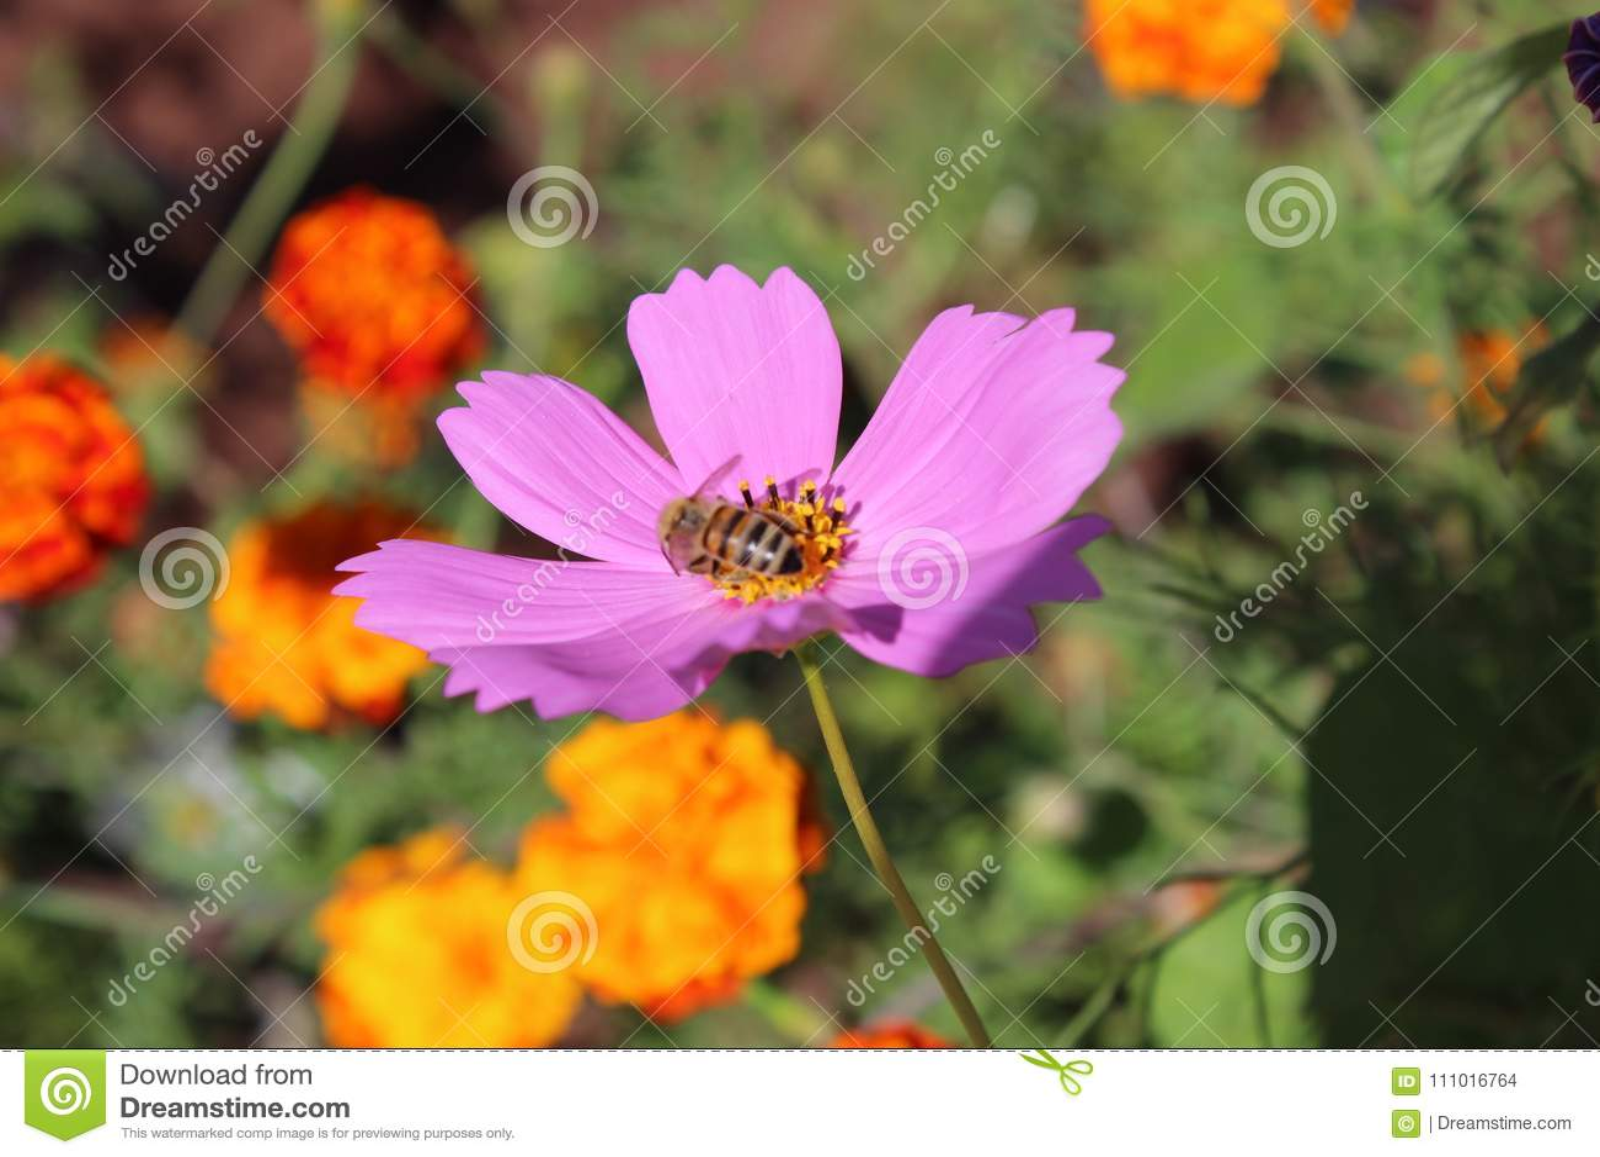 Best Flowertal Flower Stock Photo Image Of Mellow 111016764